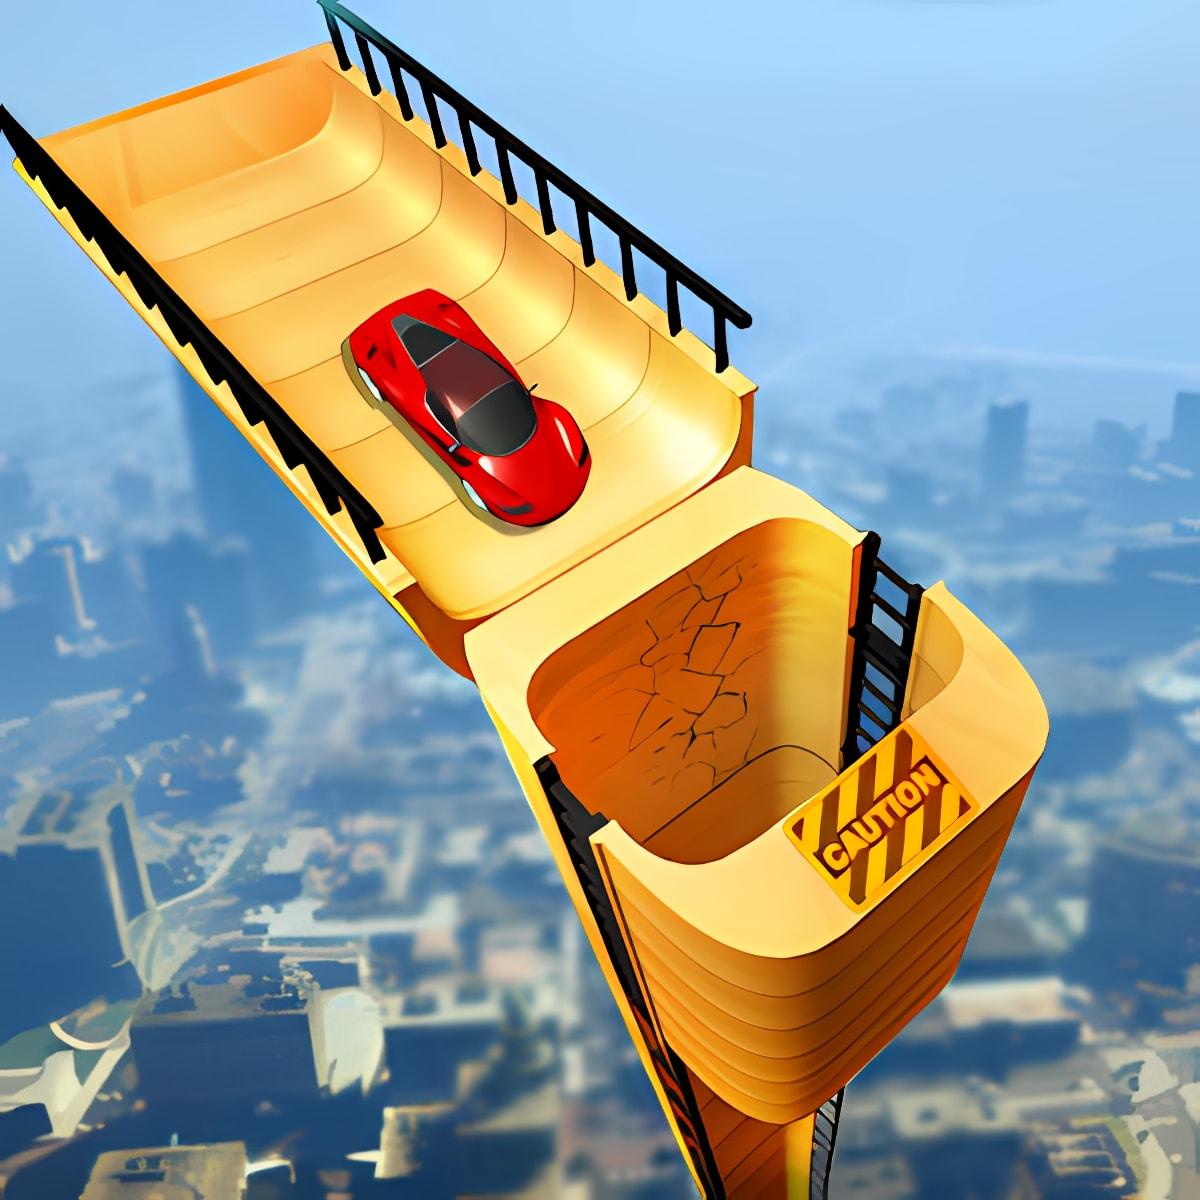 Biggest Mega Ramp Jump Driving Games Unreleased Varies with device